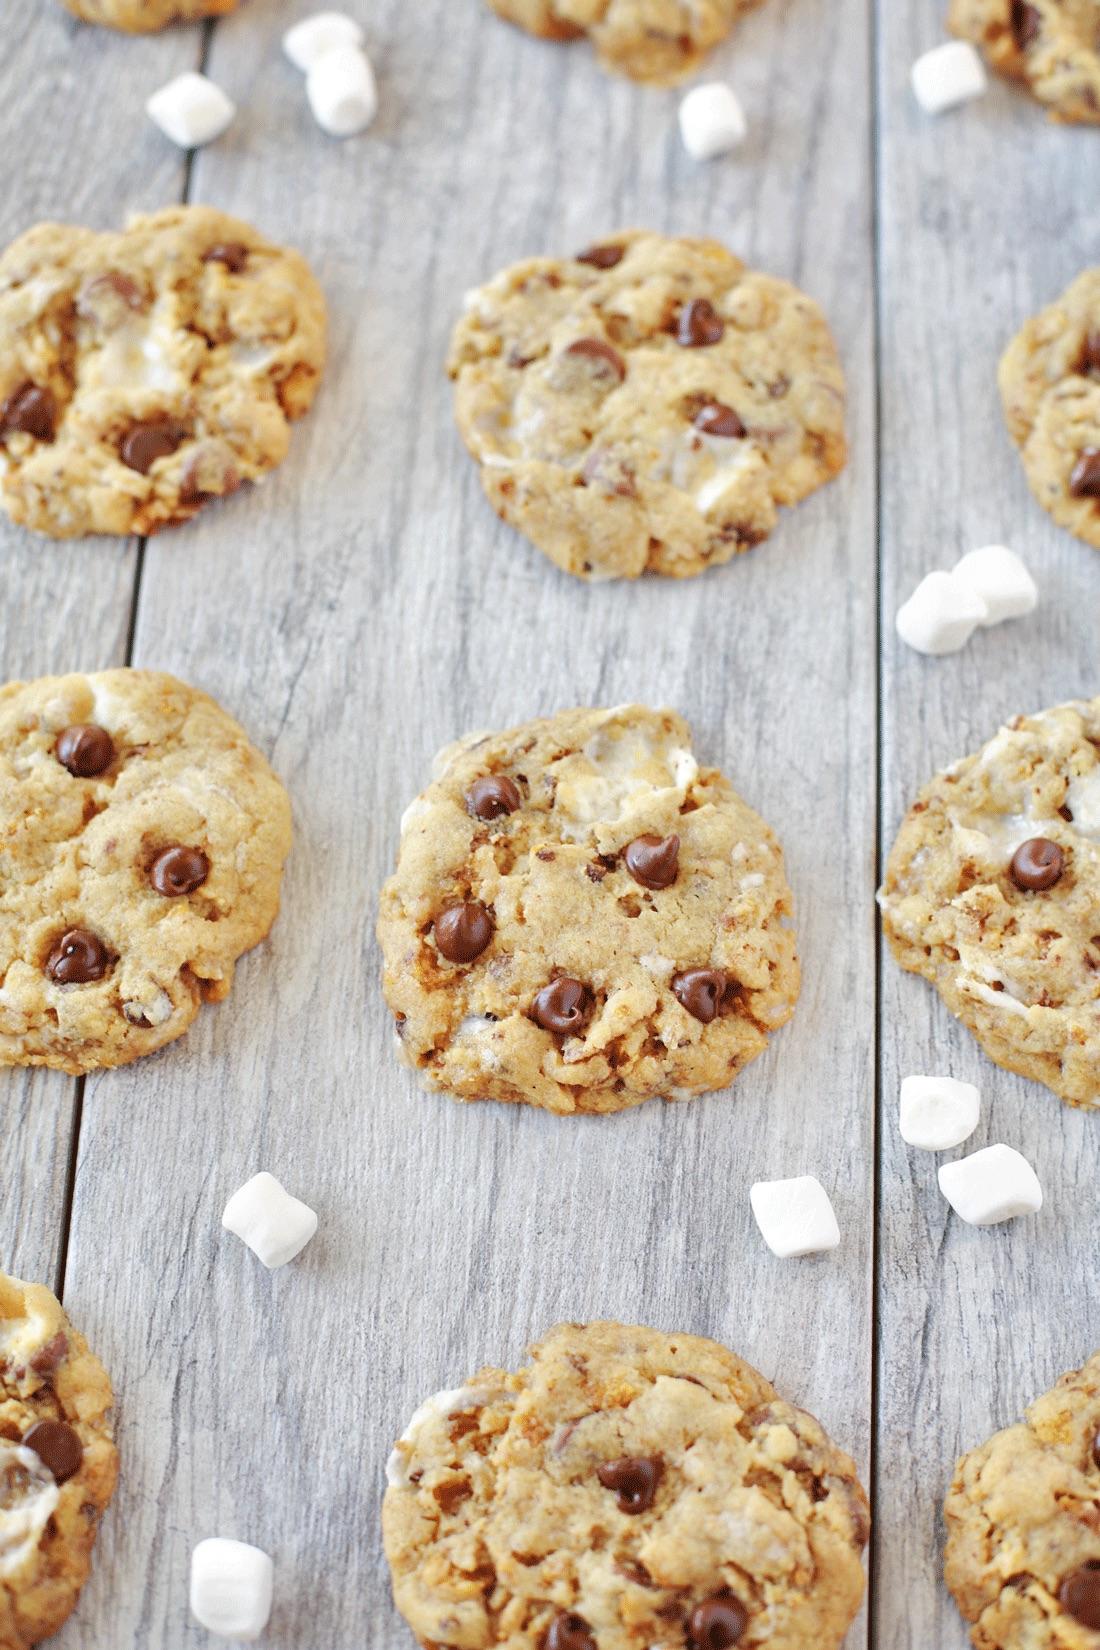 Marshmallow chocolate chip cookies recipe